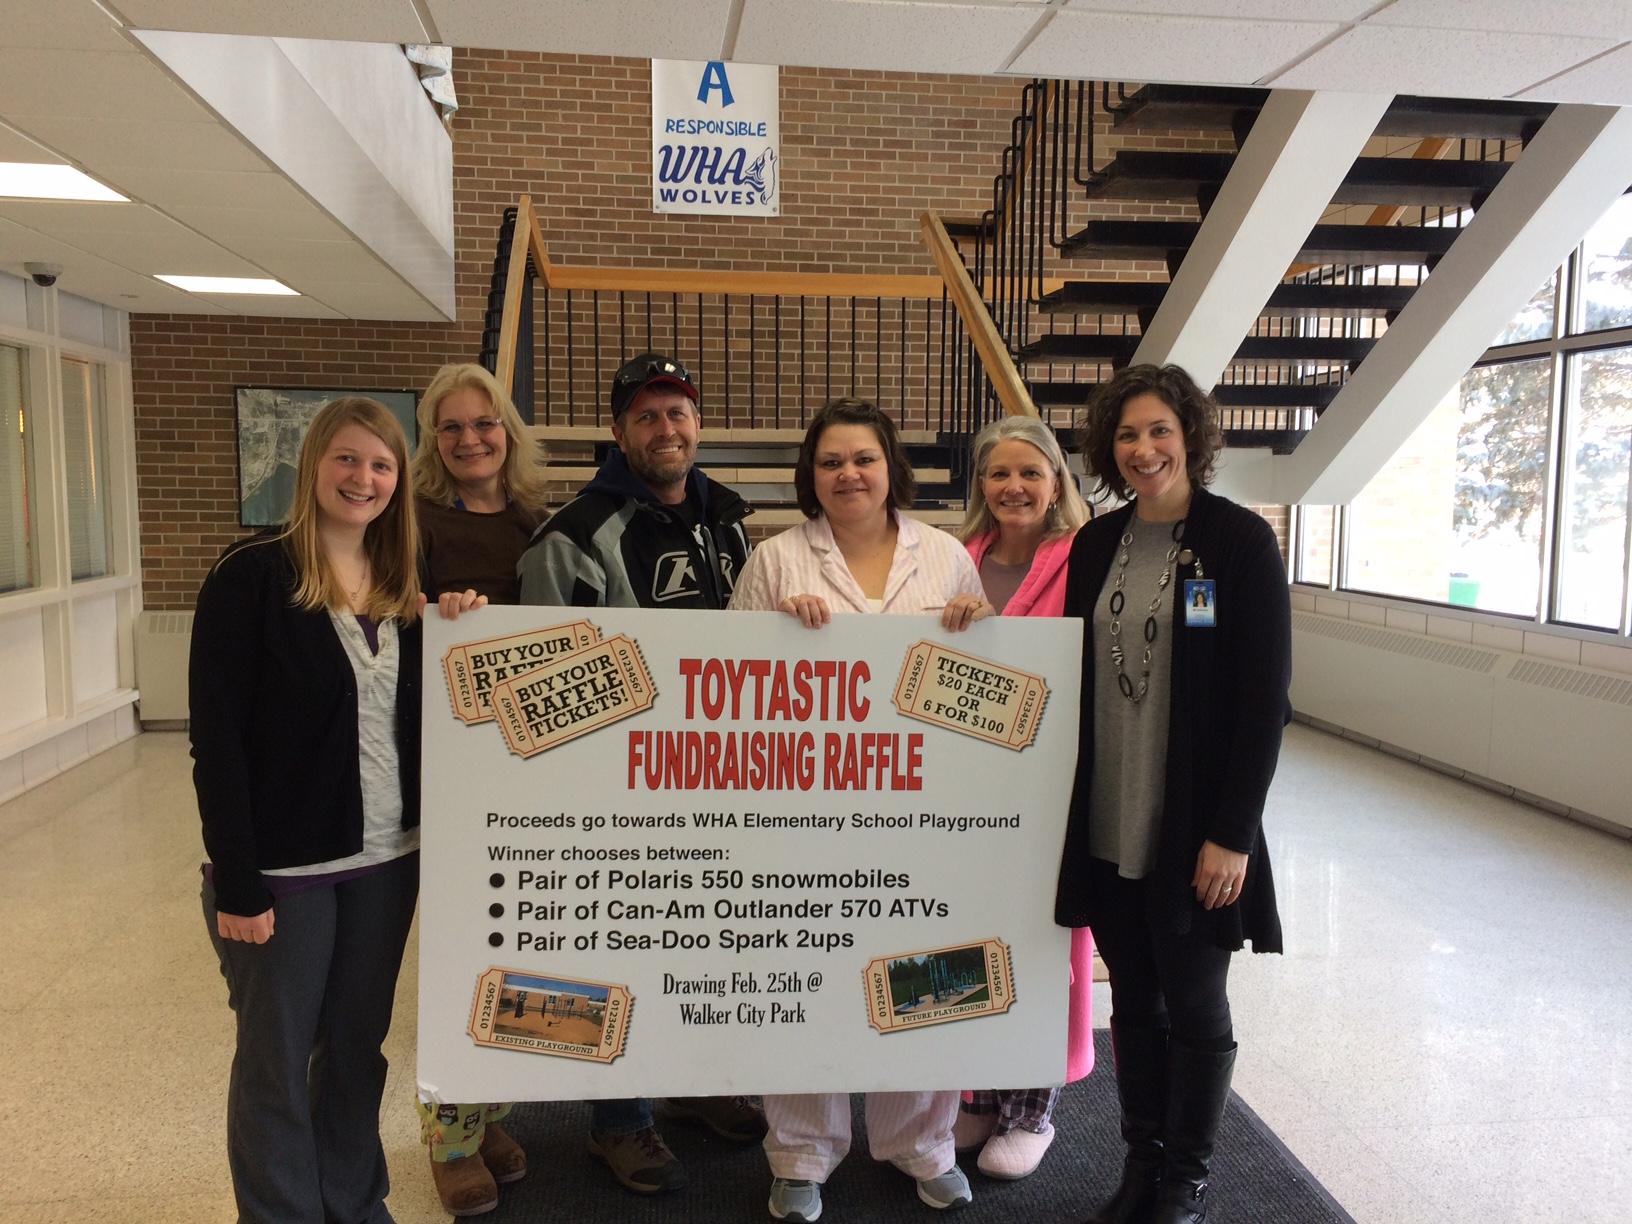 Toytastic Fundraising Raffle